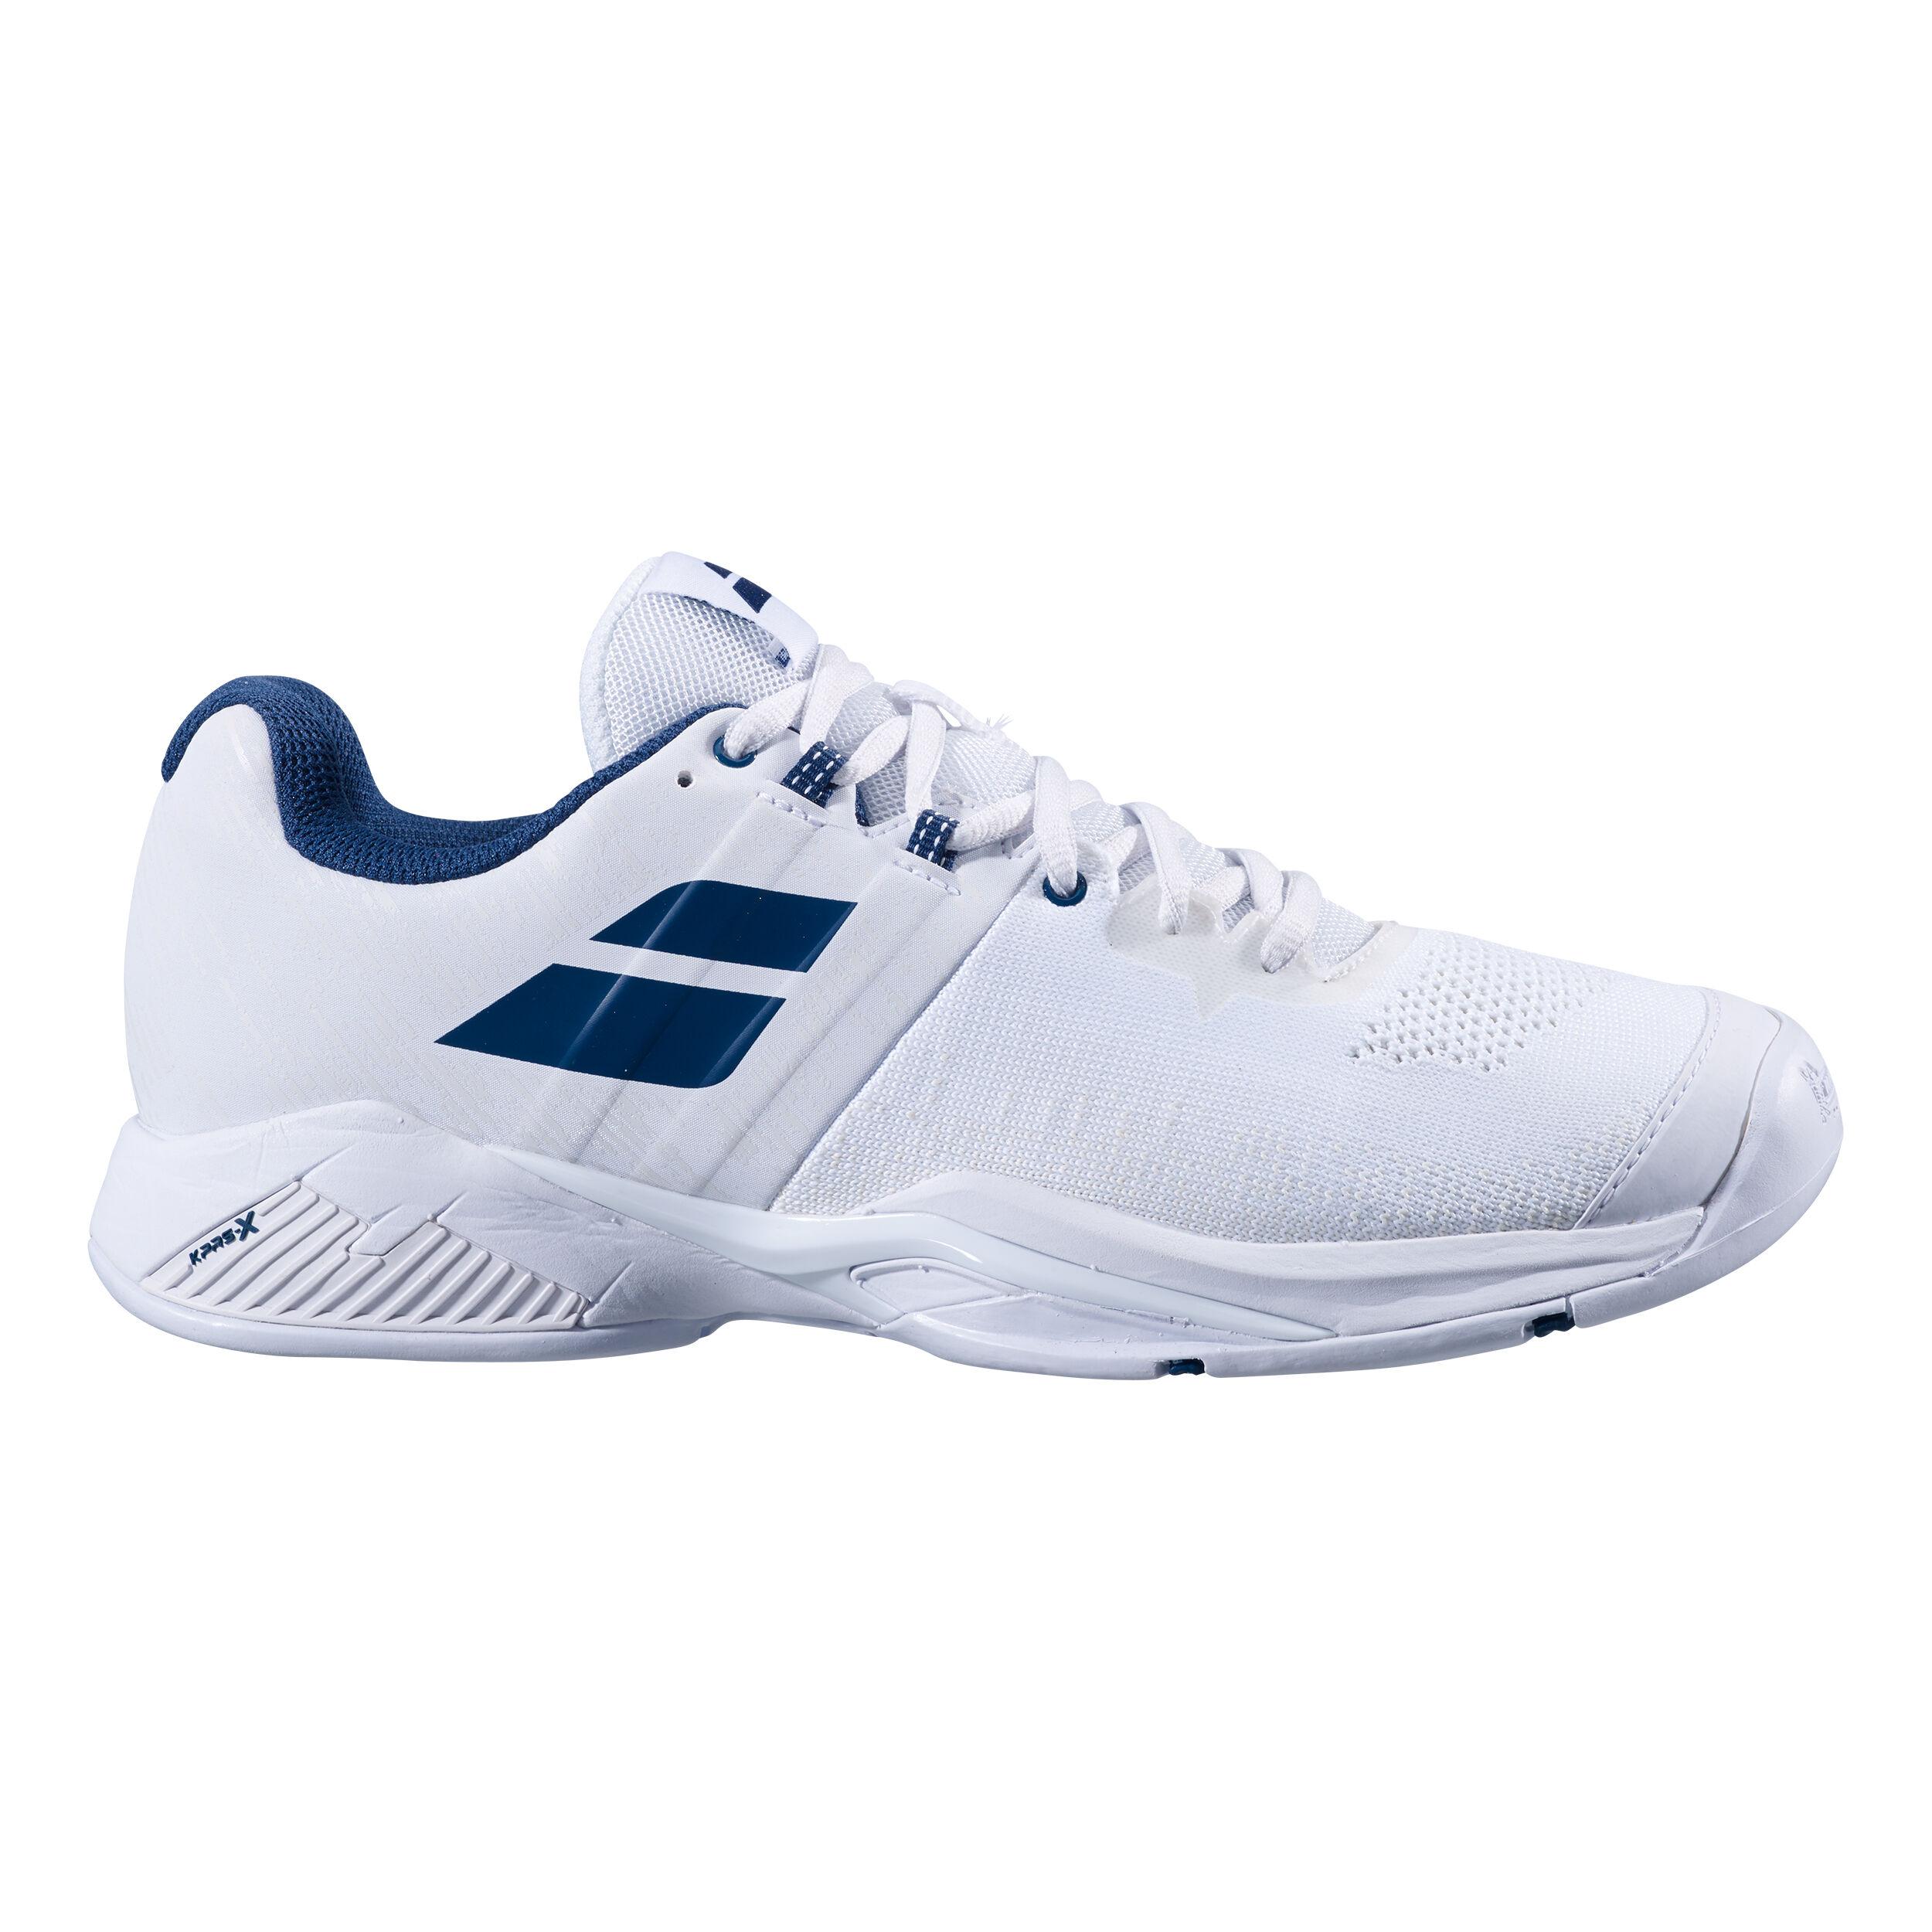 UK 5,5 Blanc Babolat Pro Pulse Blast Femmes Chaussure de Tennis - EU 38,5